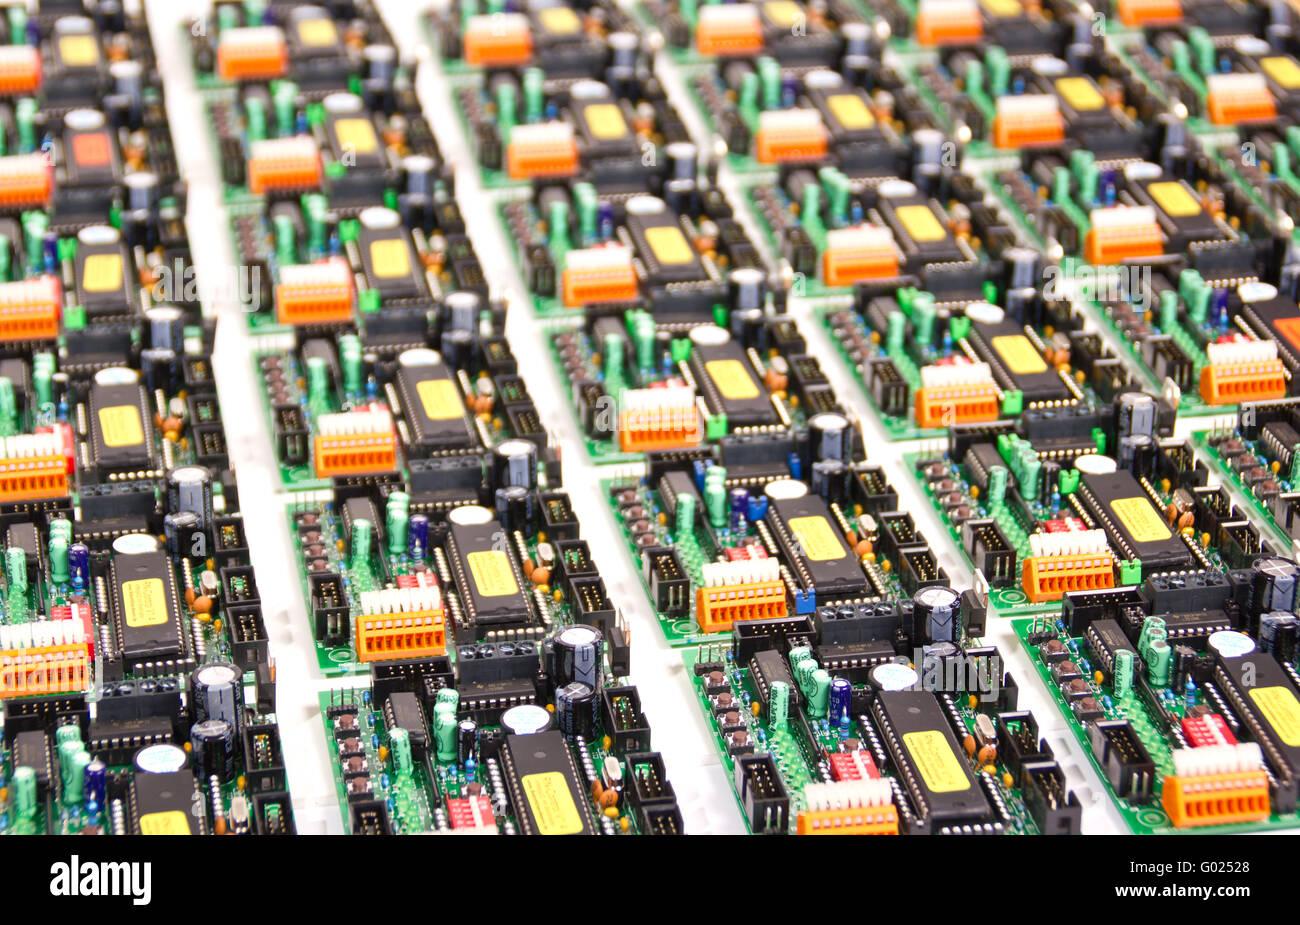 Elektronik Boards - Stock Image